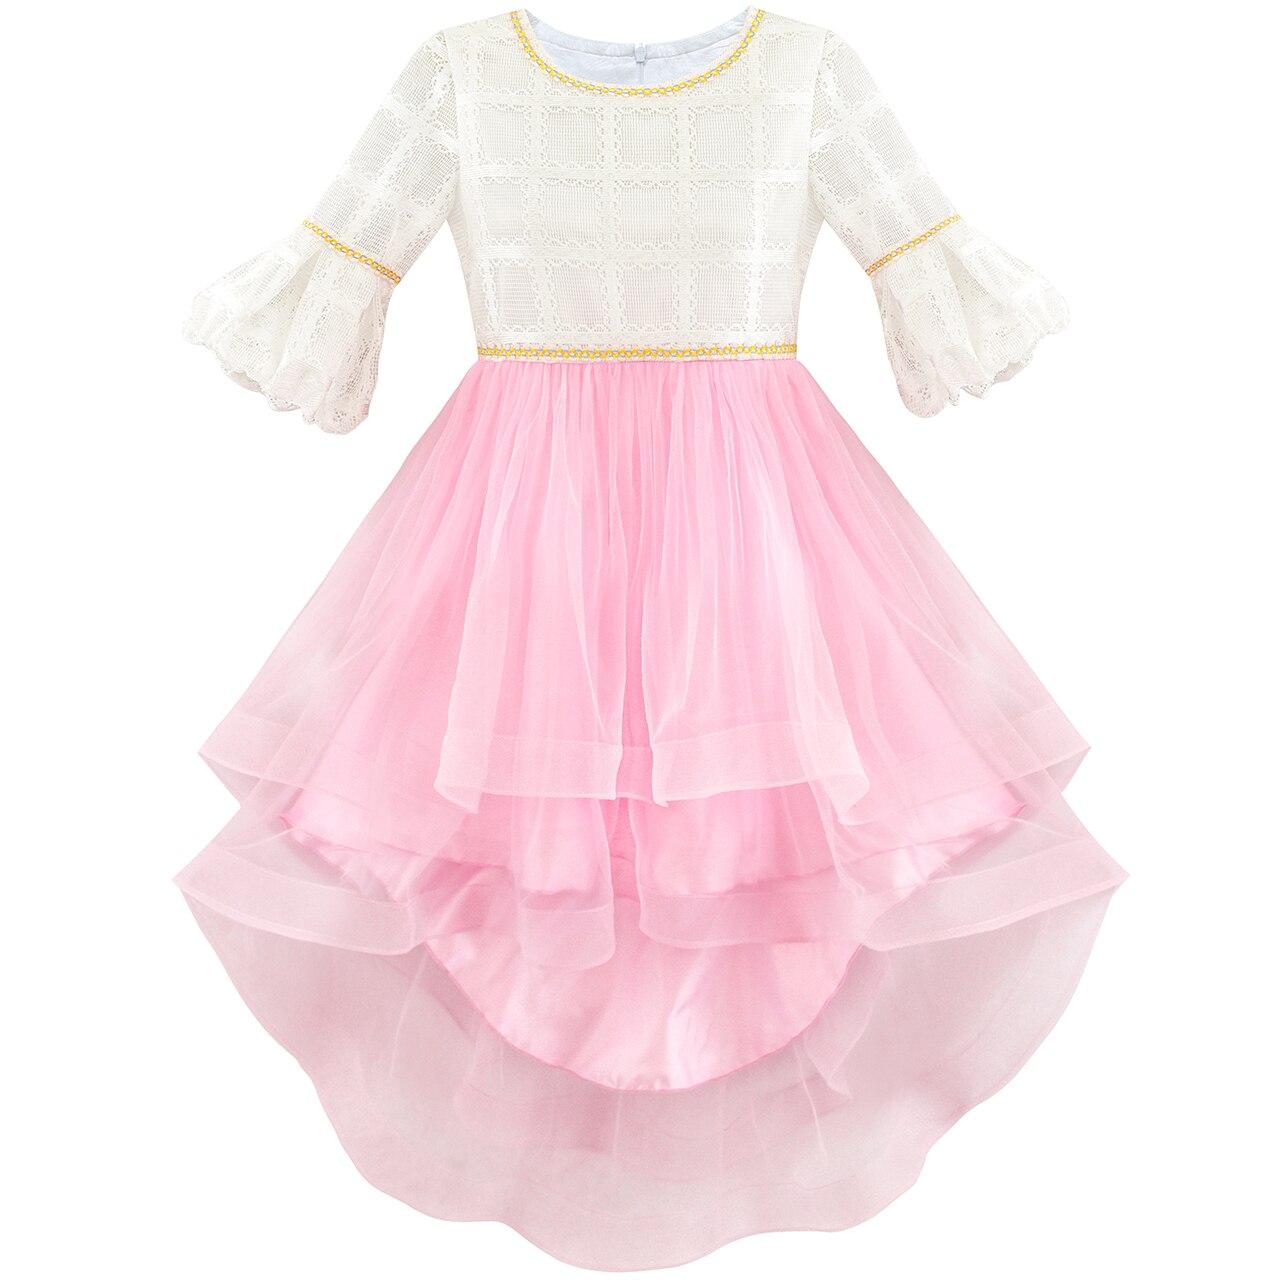 Sunny Fashion Flower Girl Dress White and Pink Hi-Lo Party Dancing Pageant 2018 Summer Princess Wedding Dresses Size 6-14 тарелка хай хэт zultan 14 aja hi hat